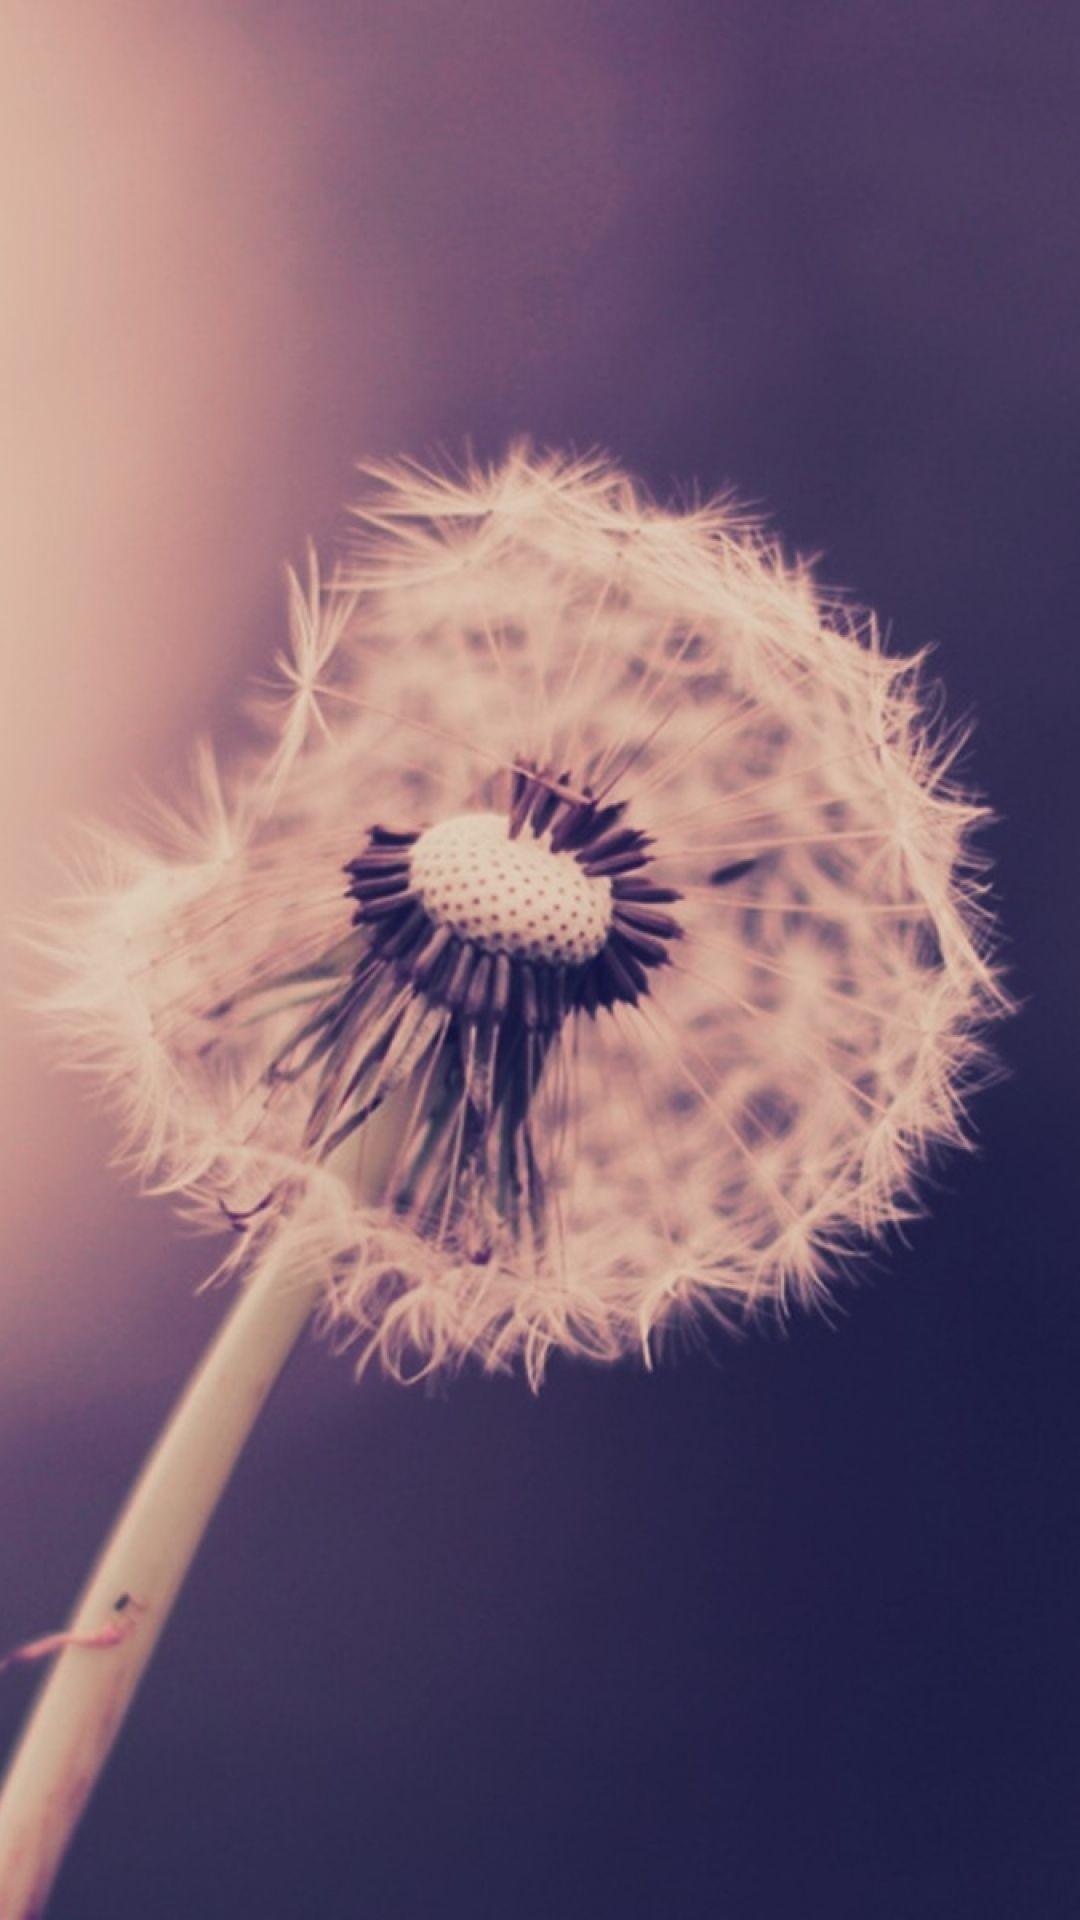 Drops On Dandelion Iphone S Wallpaper Enter My Website To Dandelion Wallpaper Dandelion Image